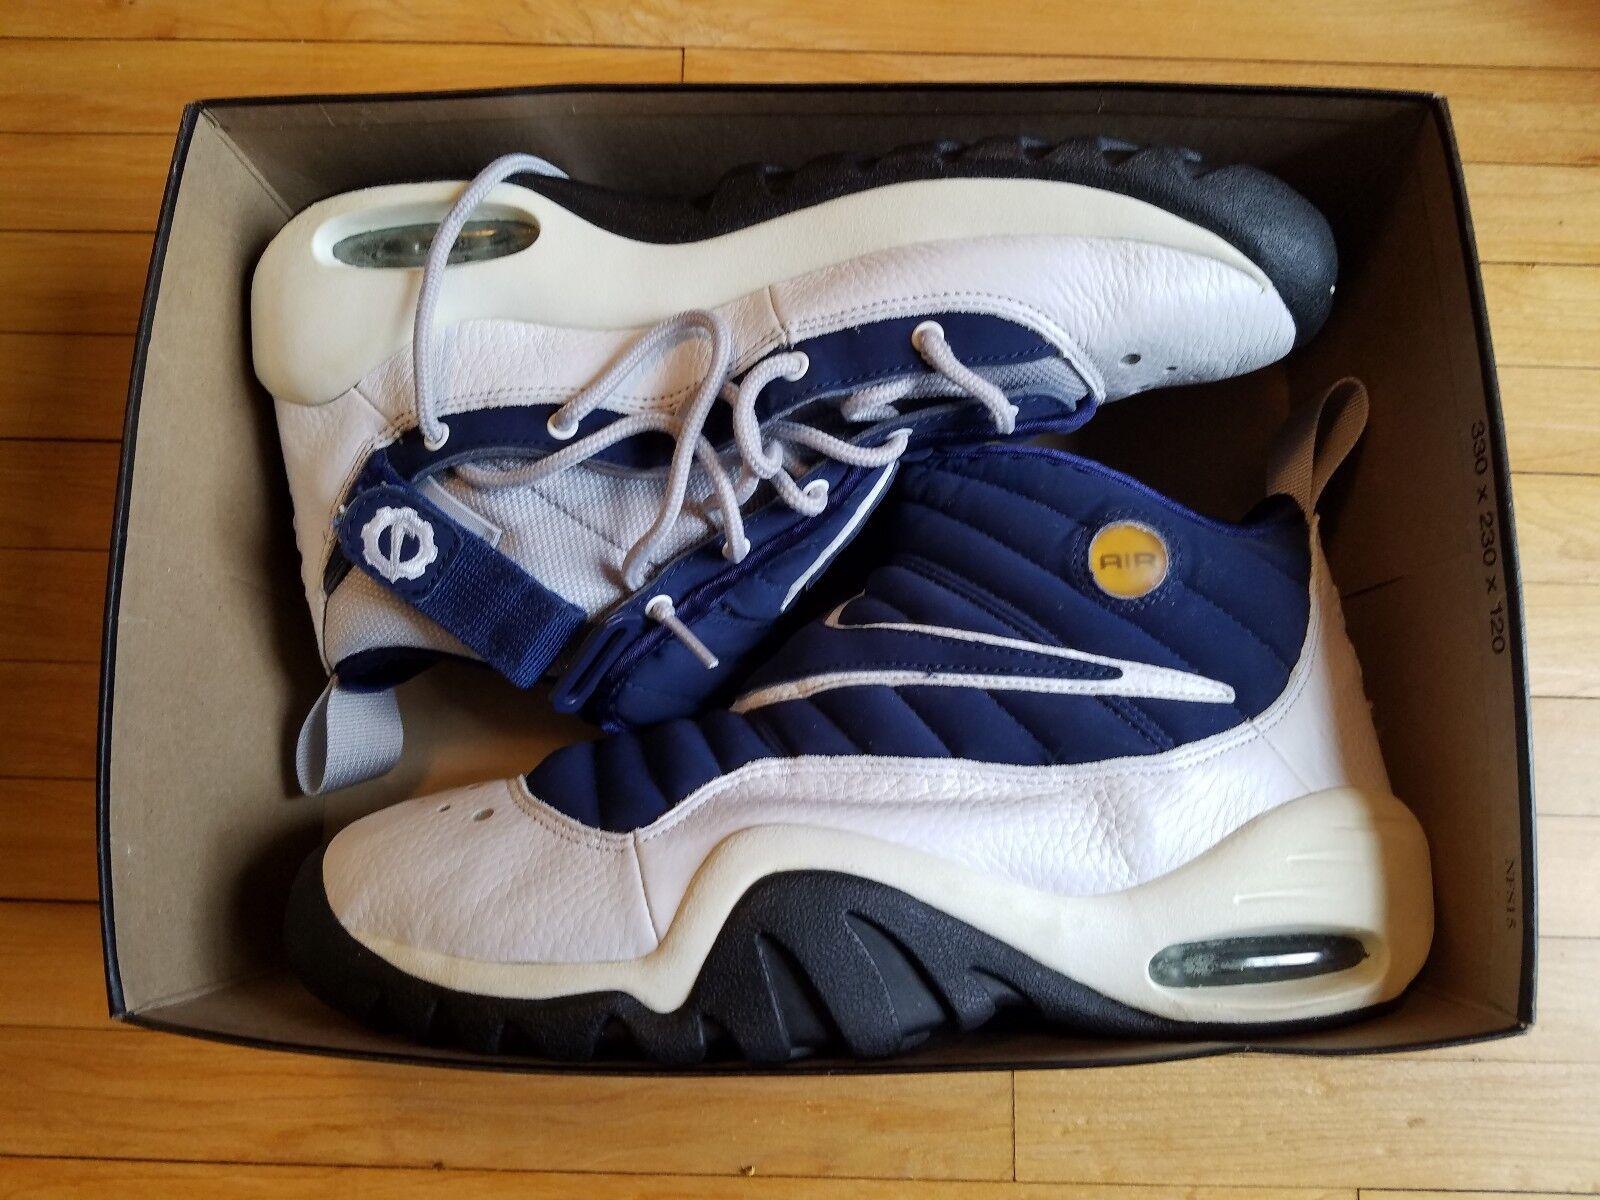 RARE! Vintage Nike AIR NDESTRUKT Rodman 630212 Blue Mens size 12 year 1990s